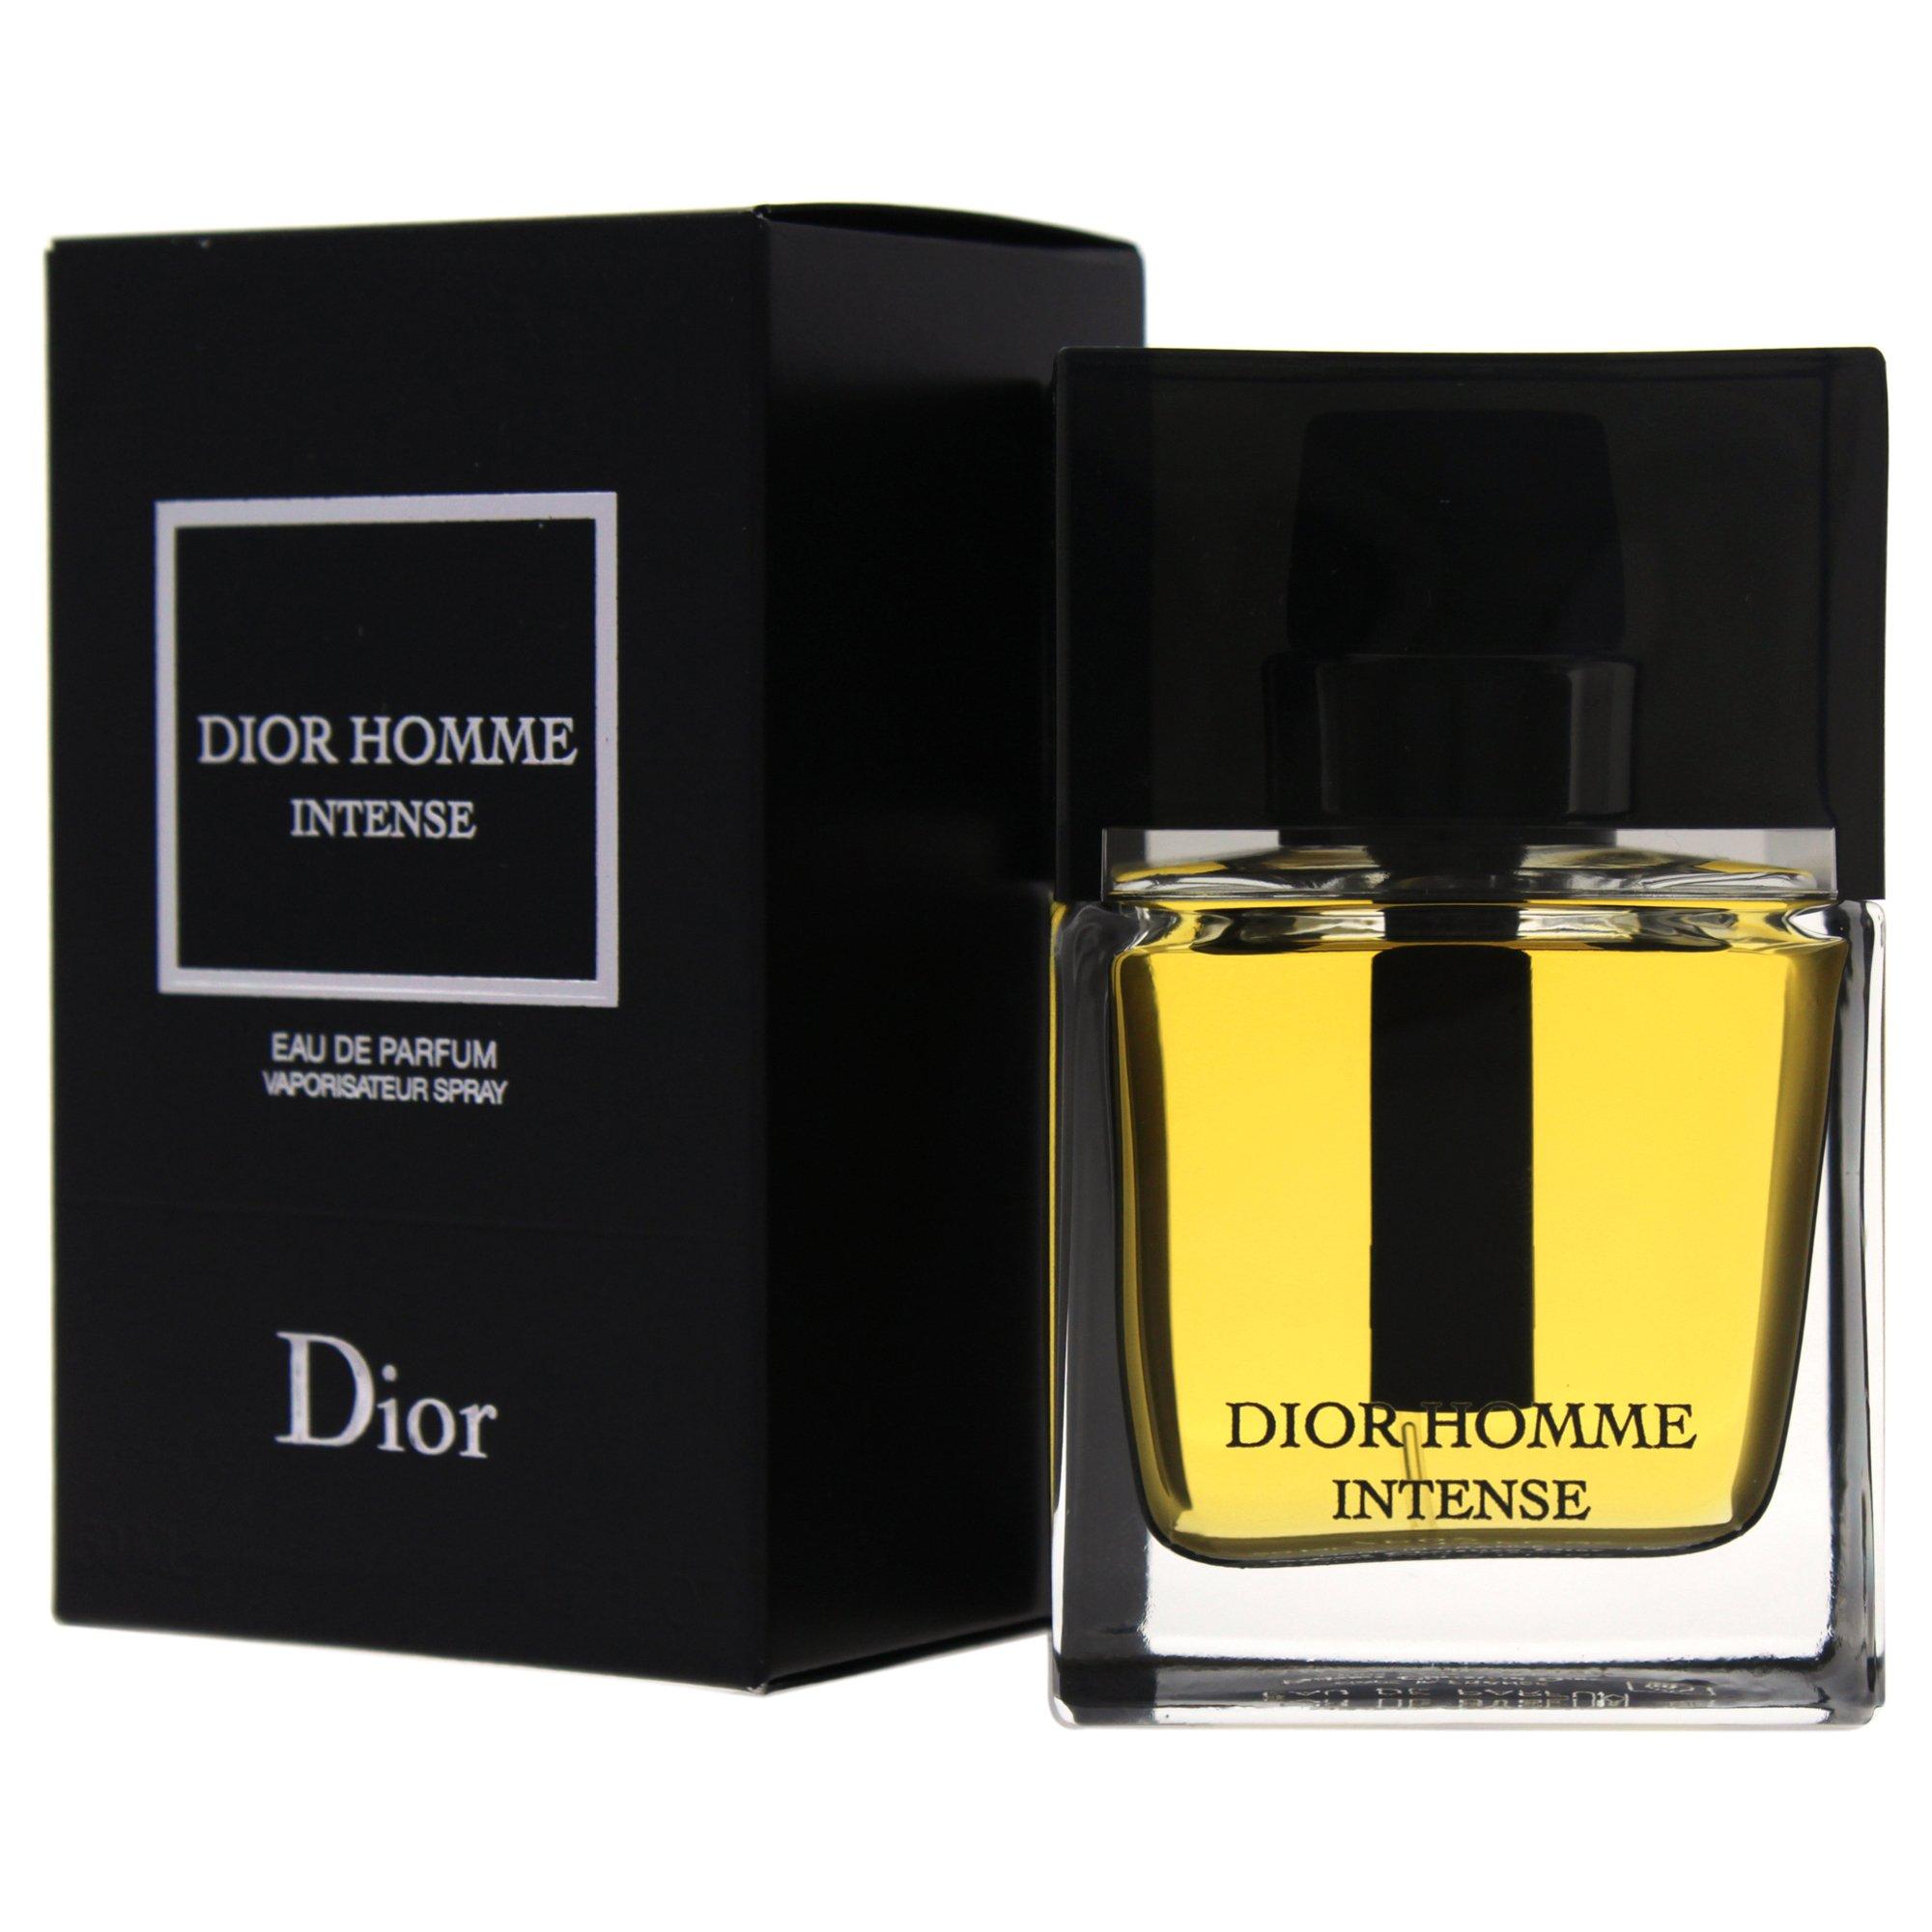 Christian Dior Dior Homme Intense Eau de Parfum Spray for Men, 1.7 Ounce -  3CW1901   Eau de Parfum   Beauty   Personal Care - tibs a1998ccde2c